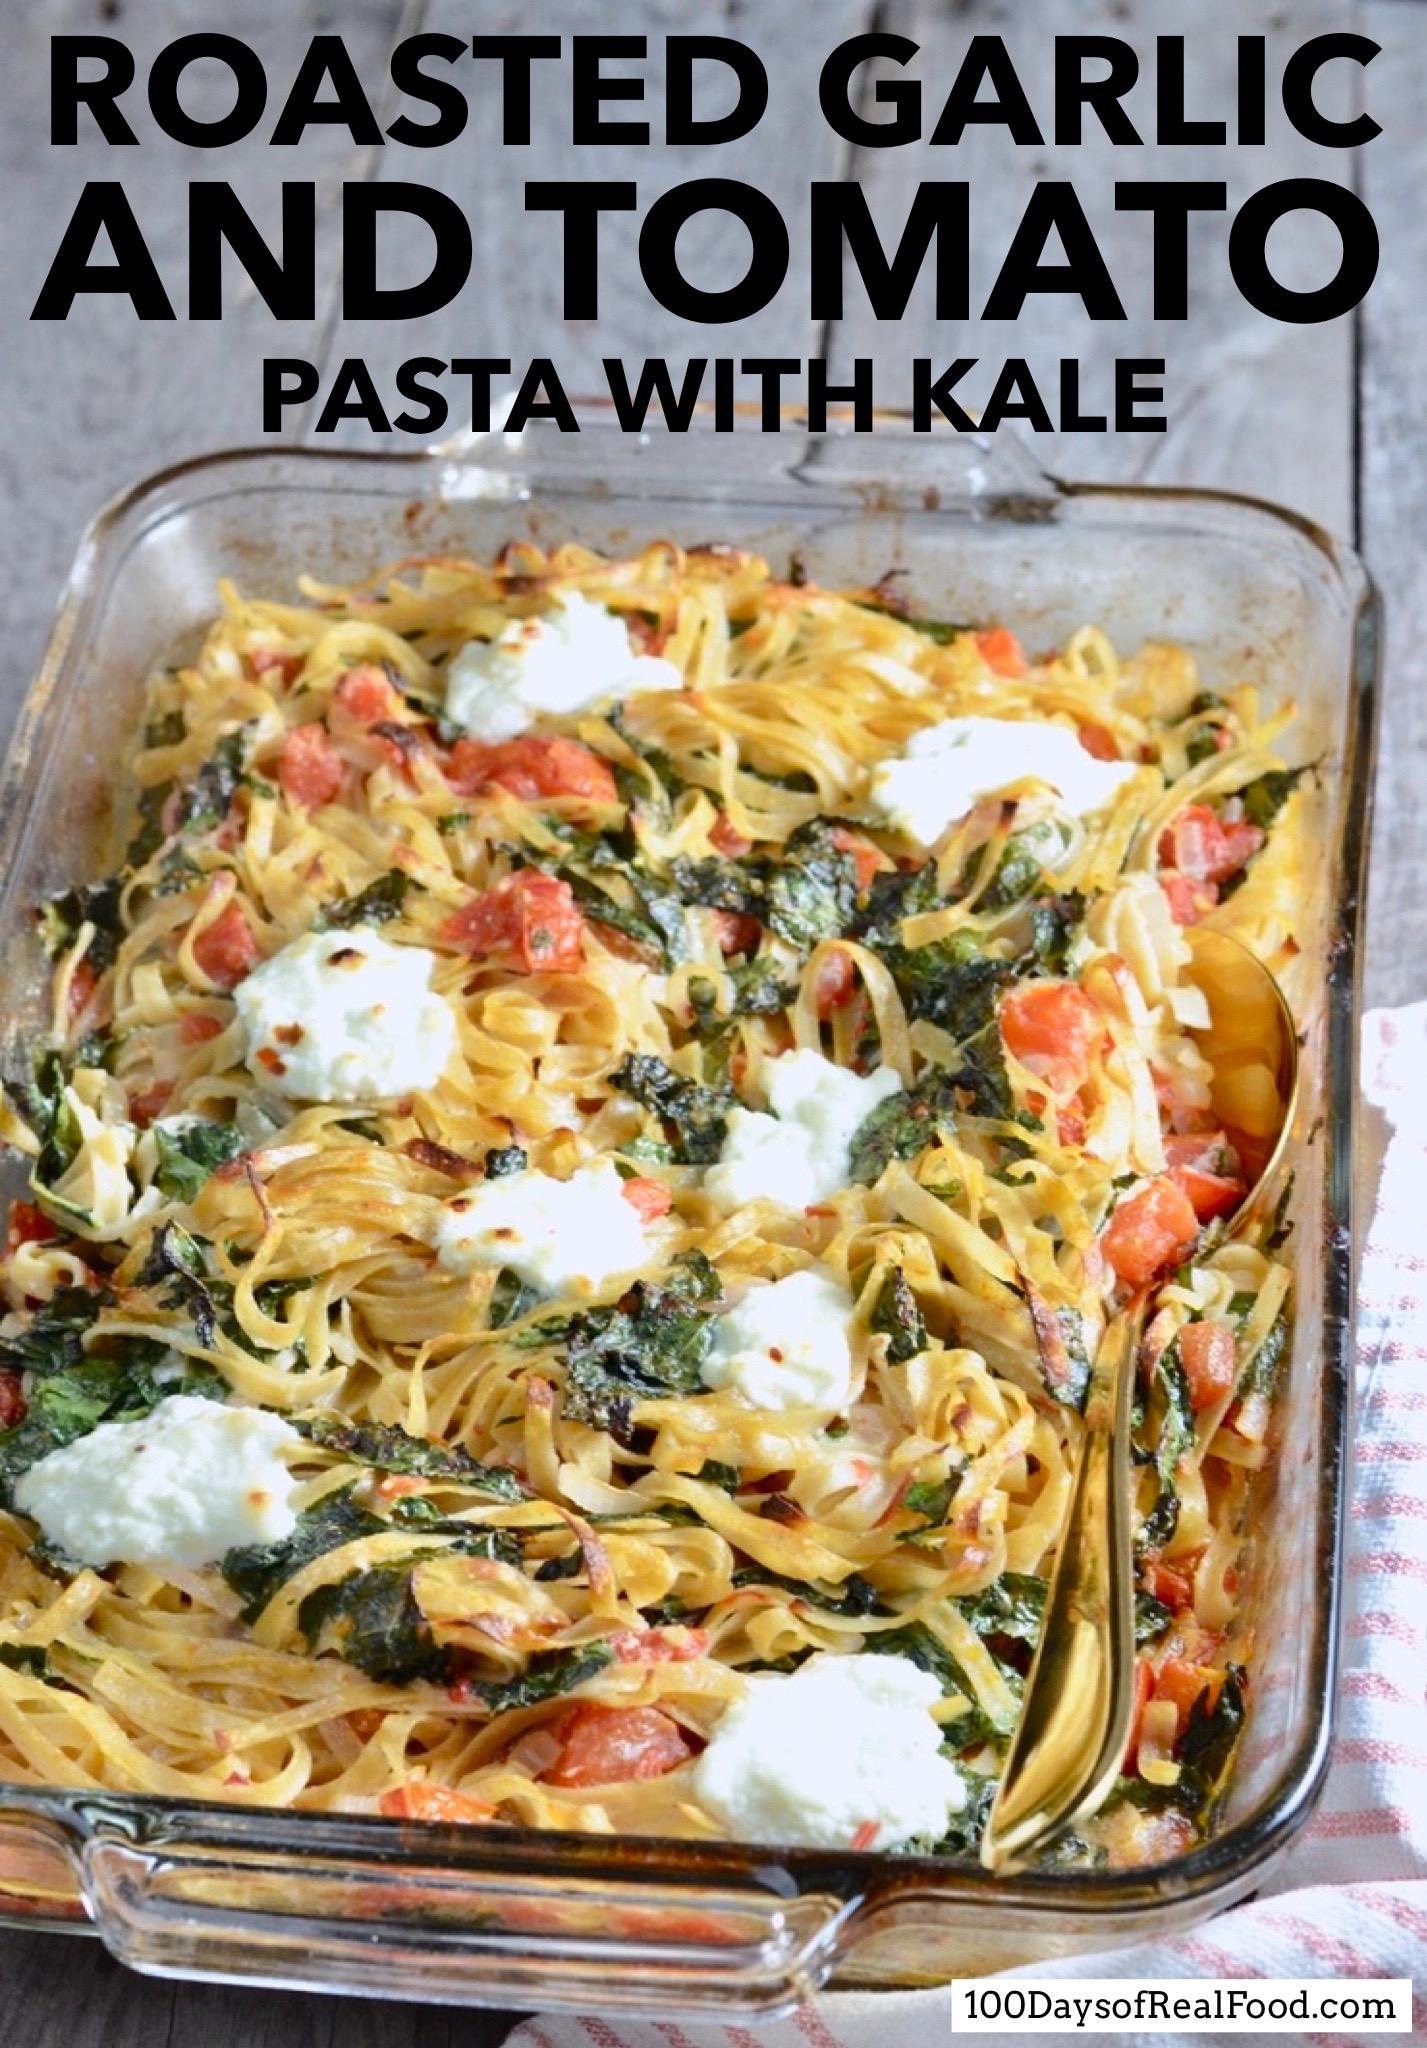 Roasted Garlic and Tomato Pasta with Kale in rectangular baking dish